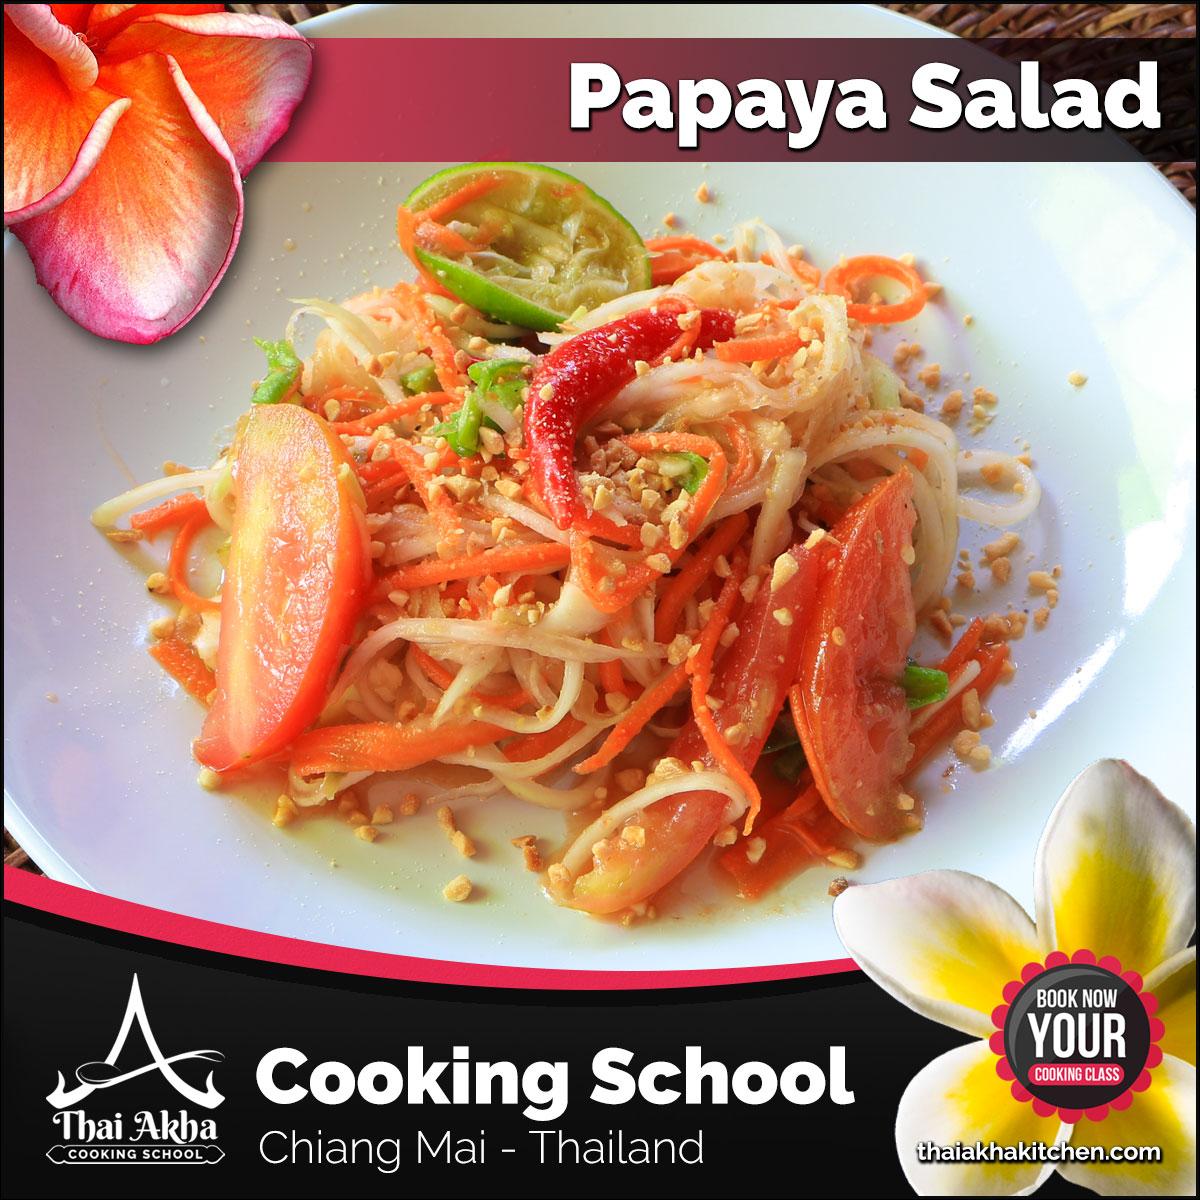 PapayaSalad - Thai Akha Kitchen